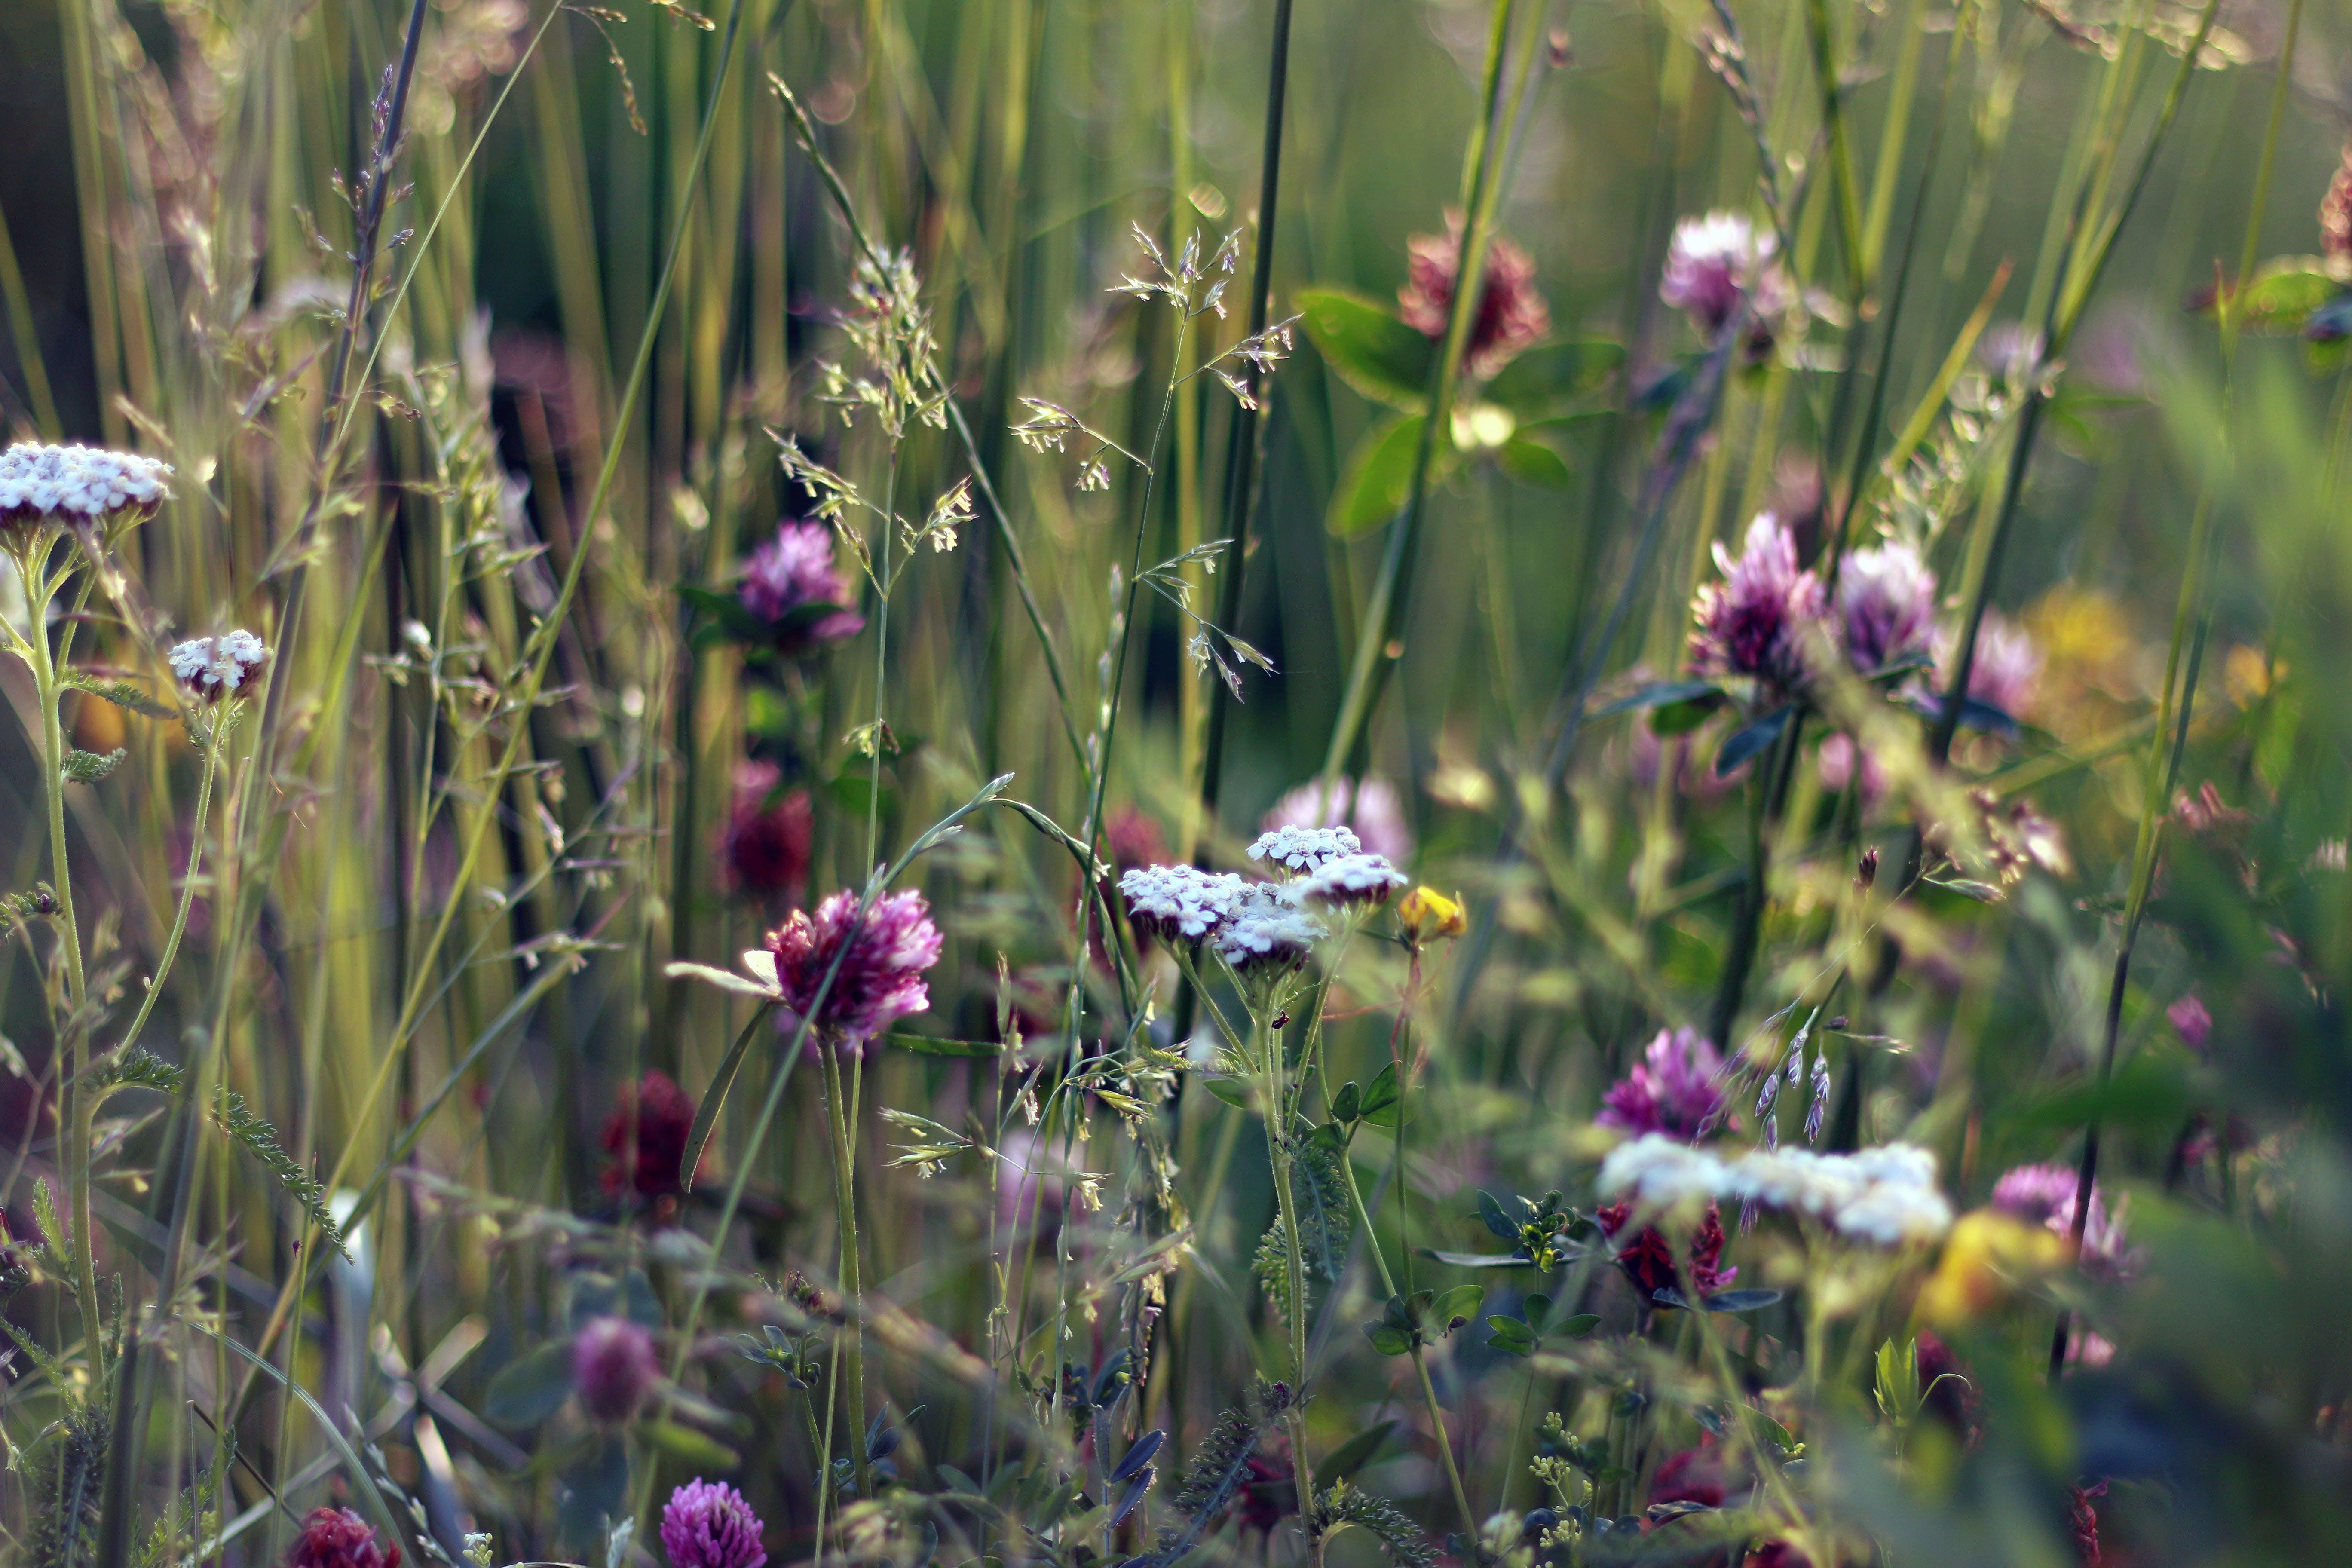 Kostenloses Stock Foto zu blumen, feld, gras, natur